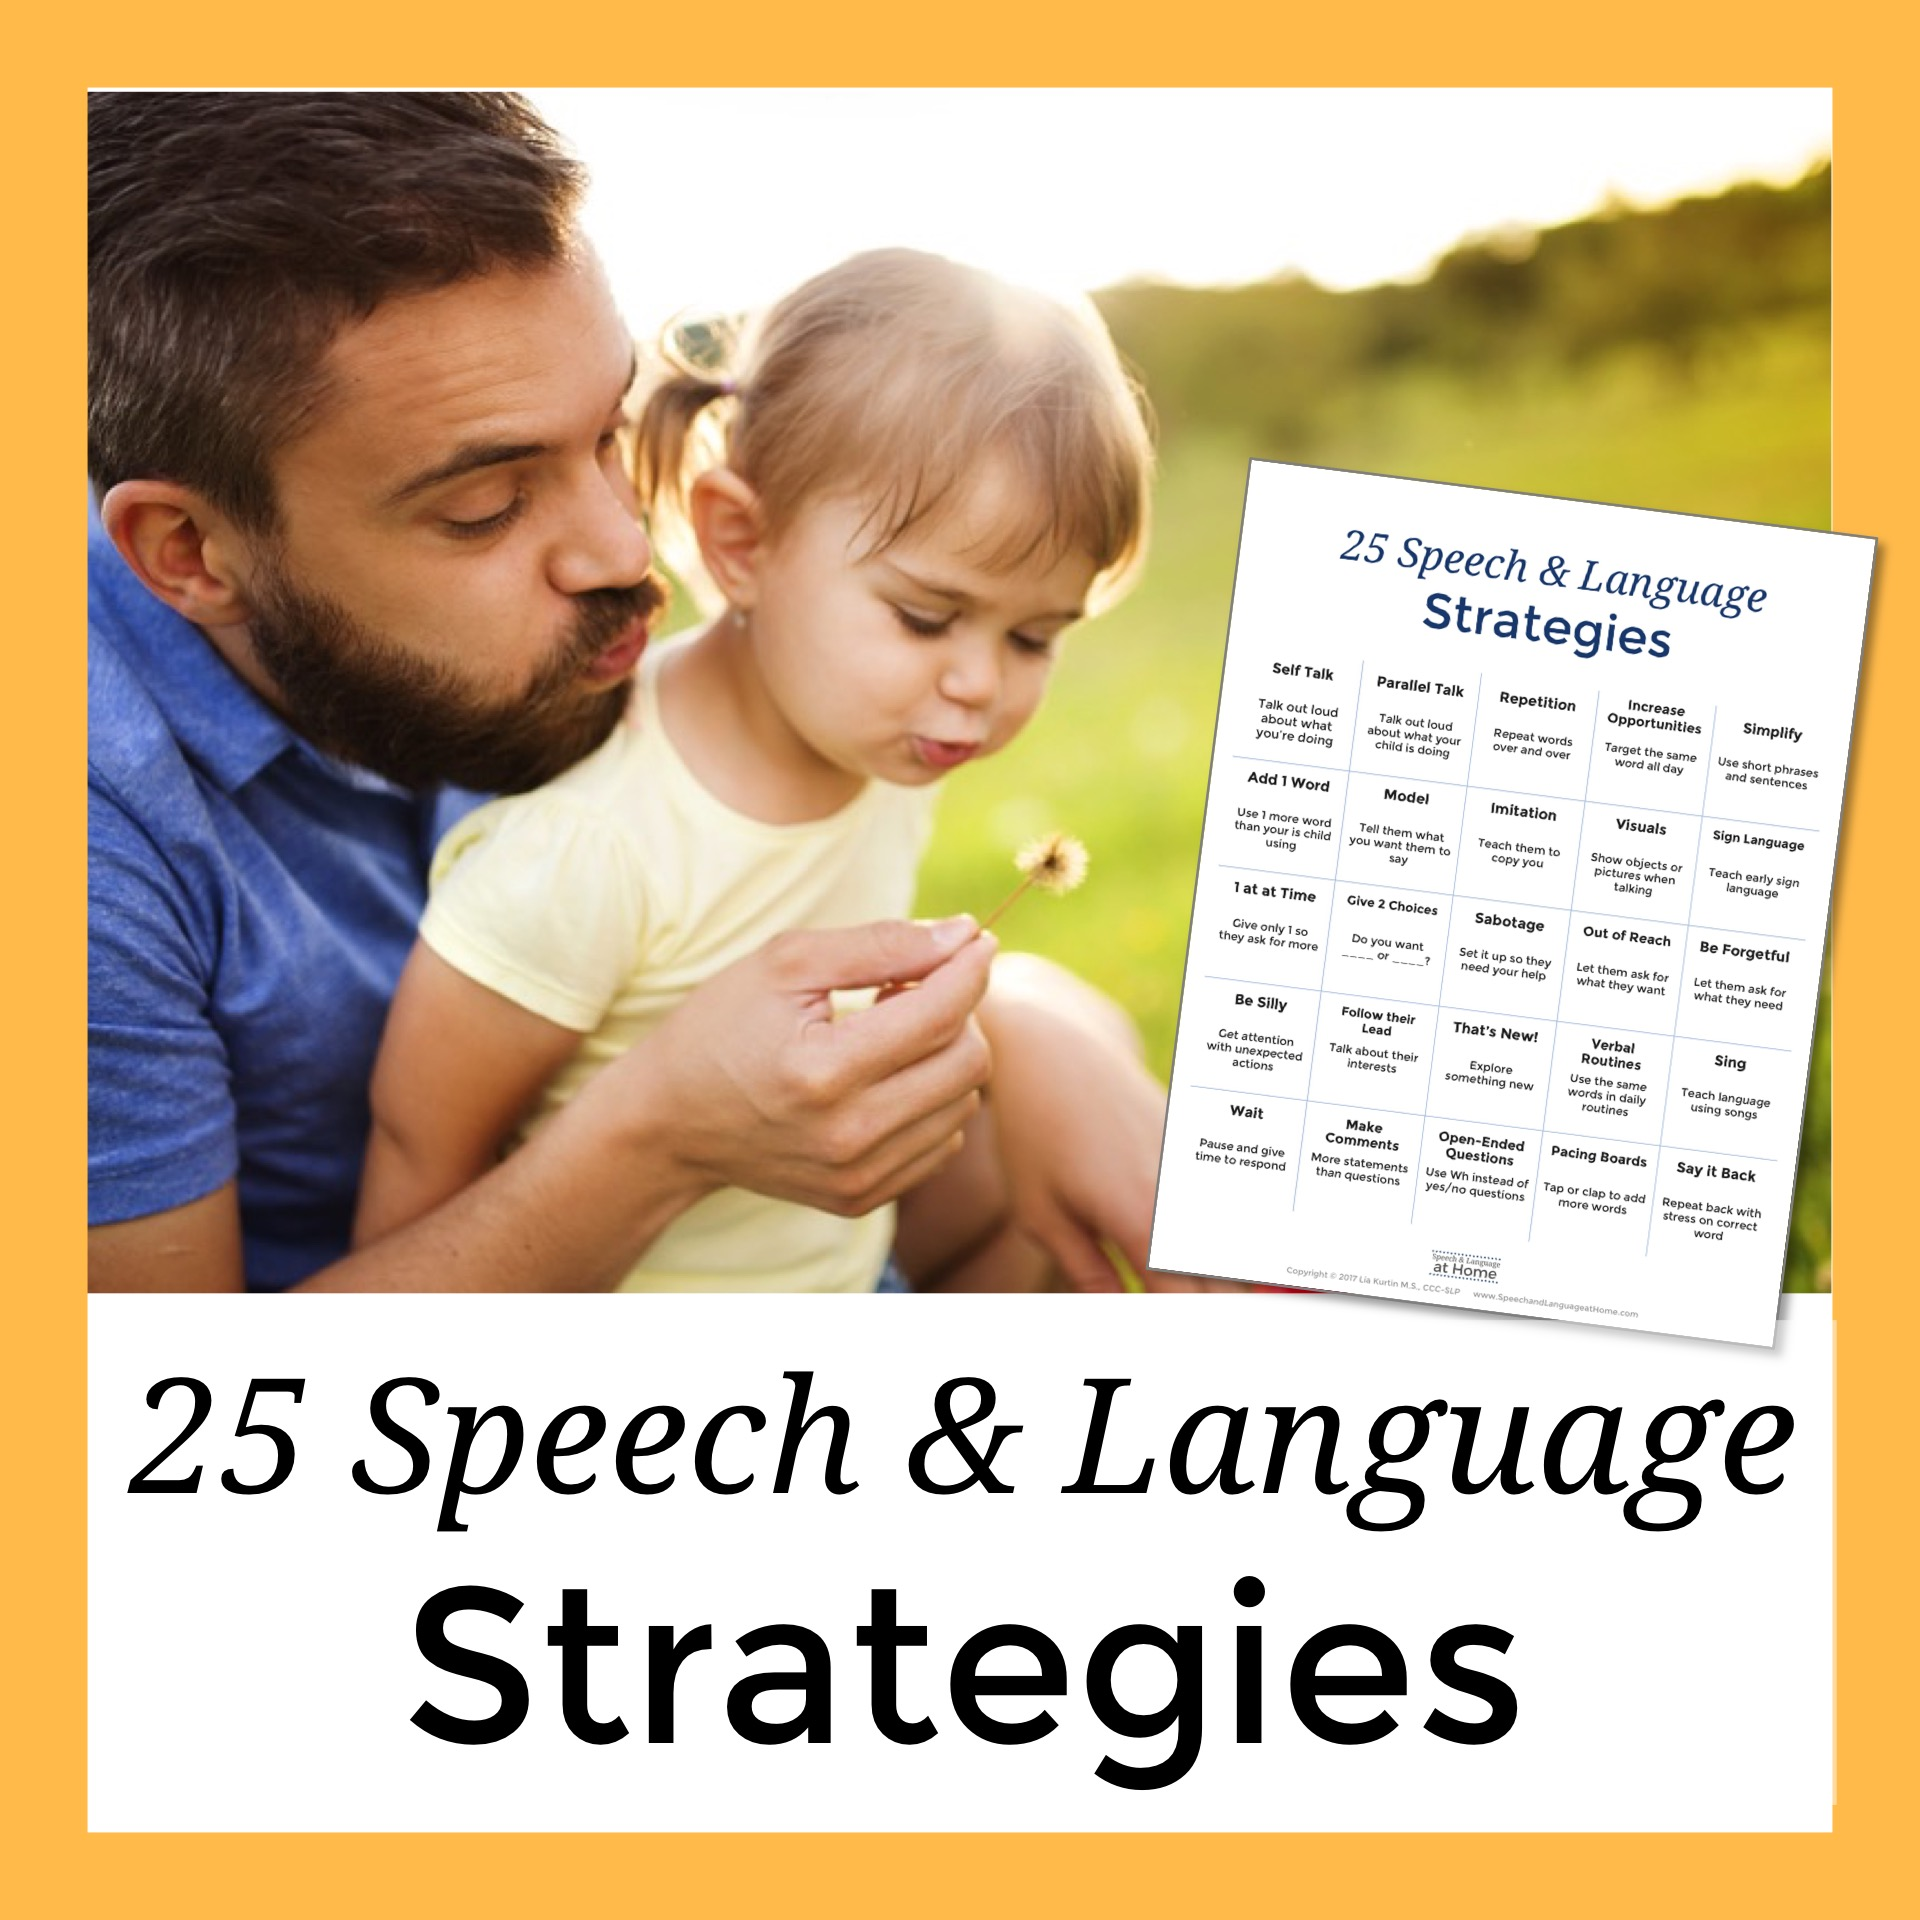 25 Speech and Language Strategy Videos